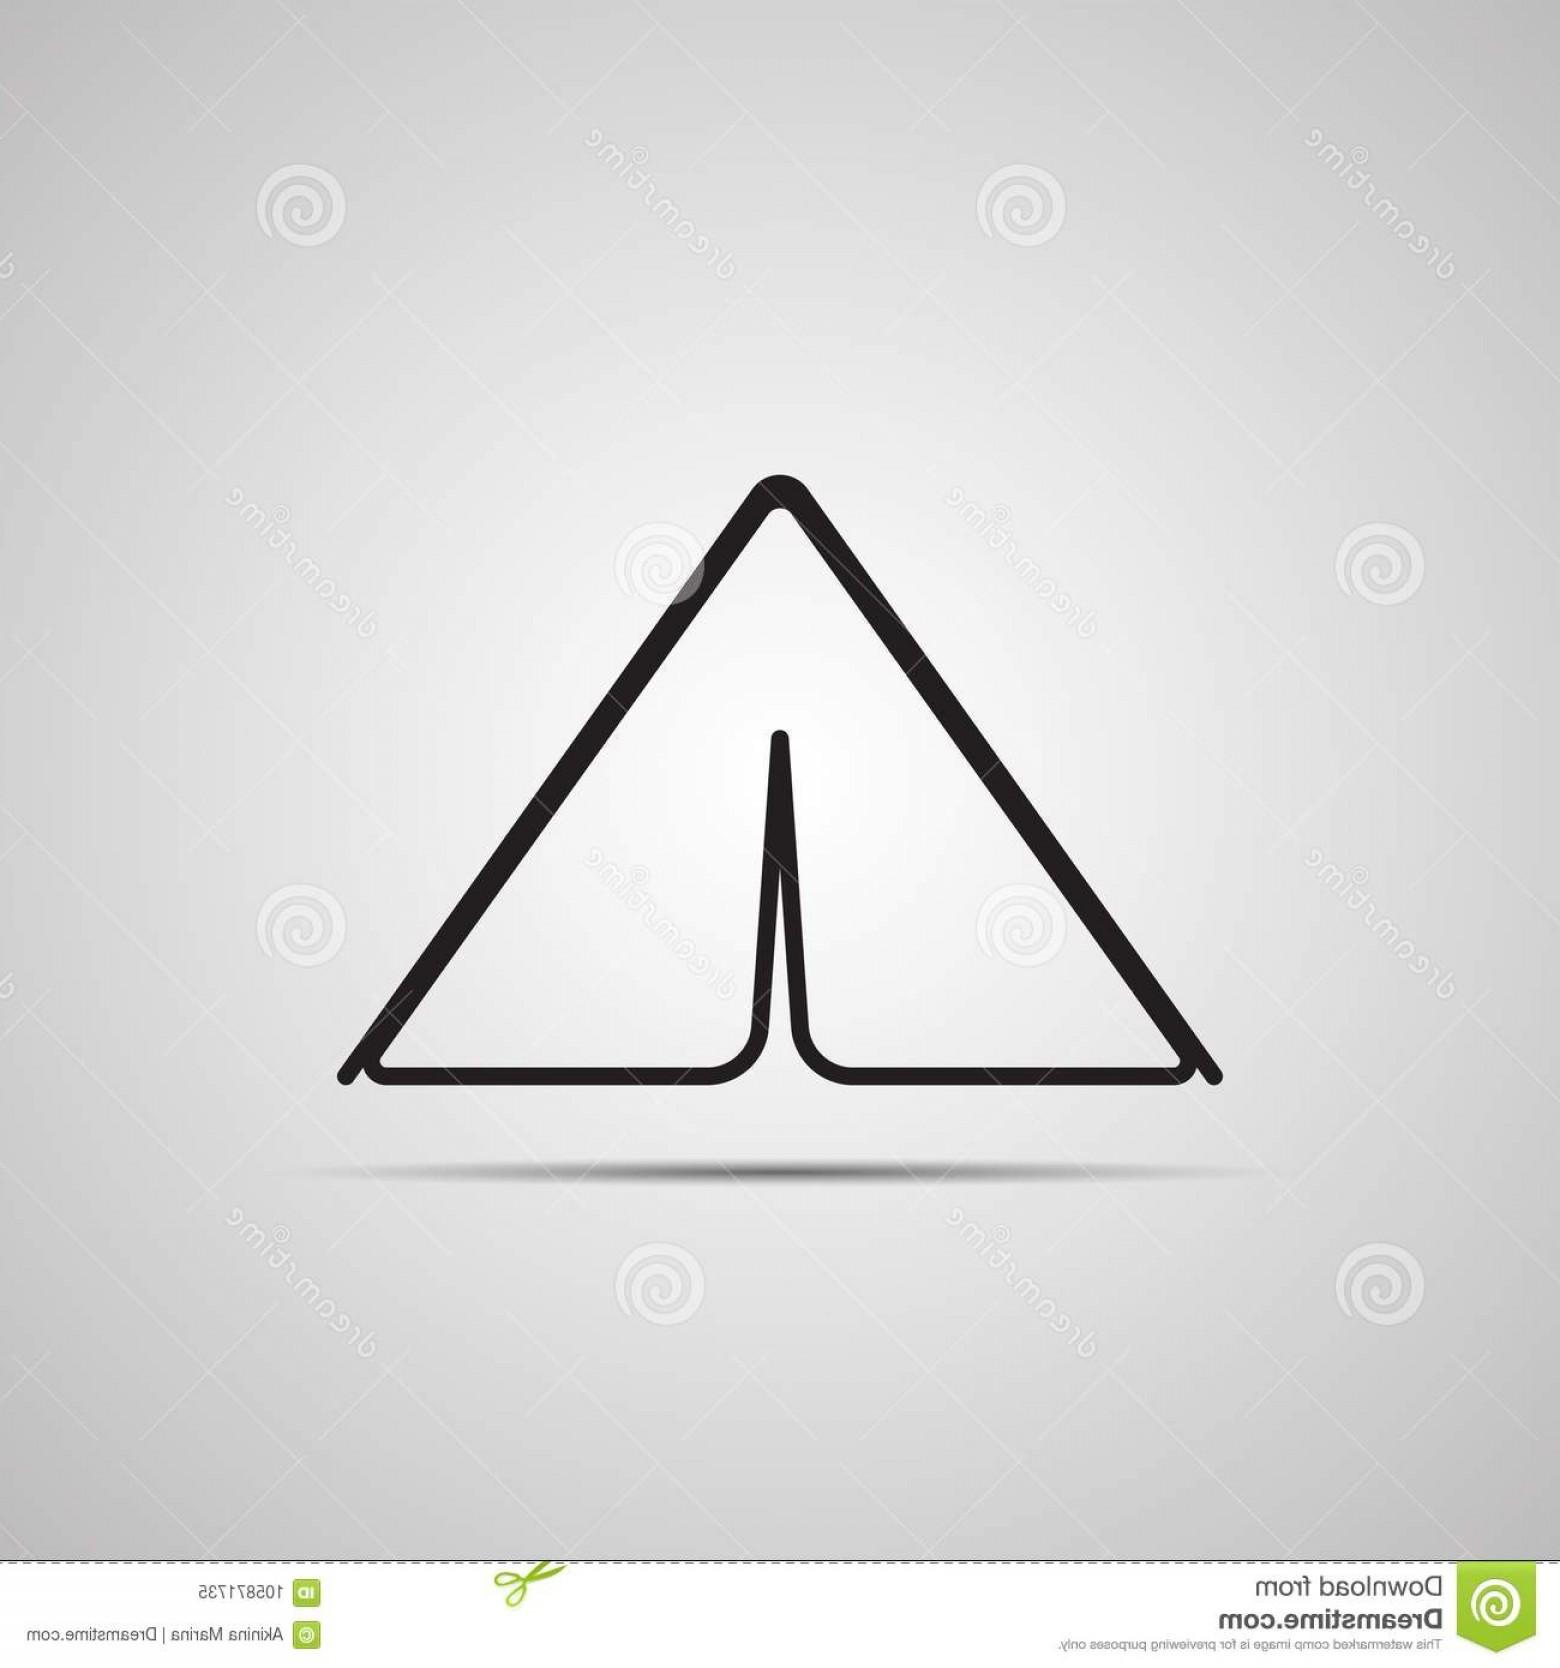 1560x1668 Silhouette Flat Icon Vector Design Illustration Tent Symbol